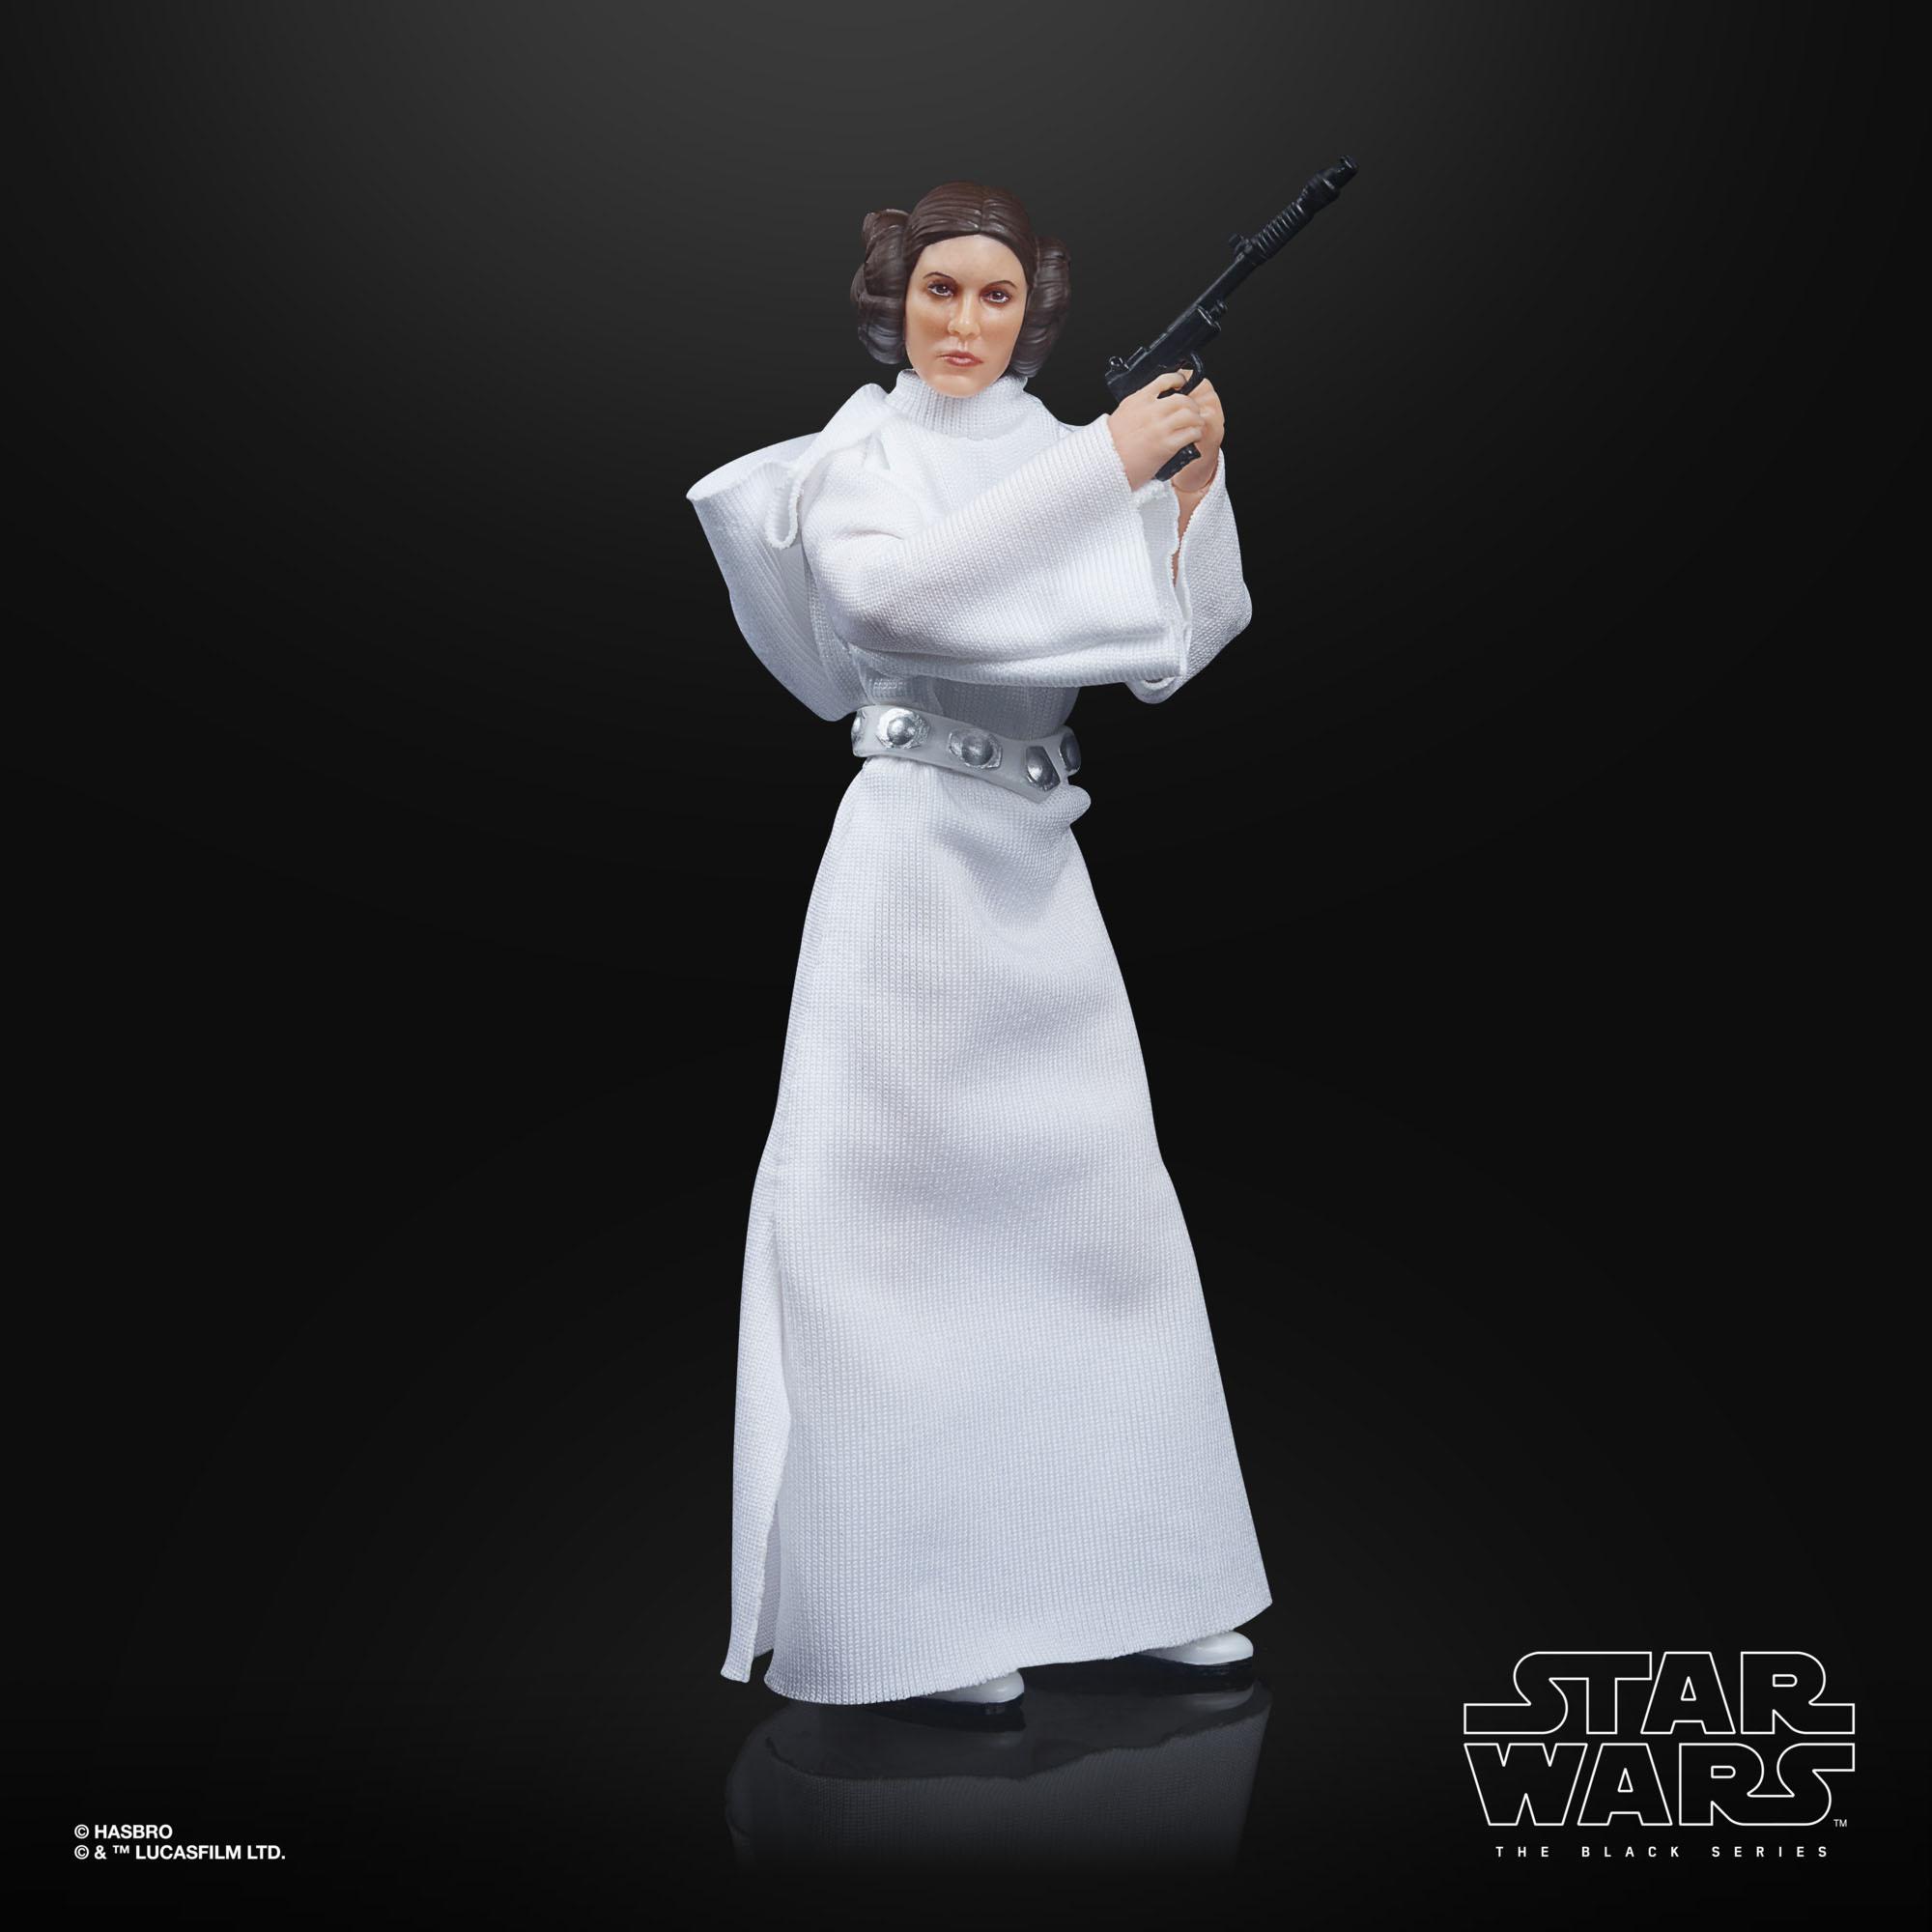 Star Wars The Black Series Archive Princess Leia Organa F1908